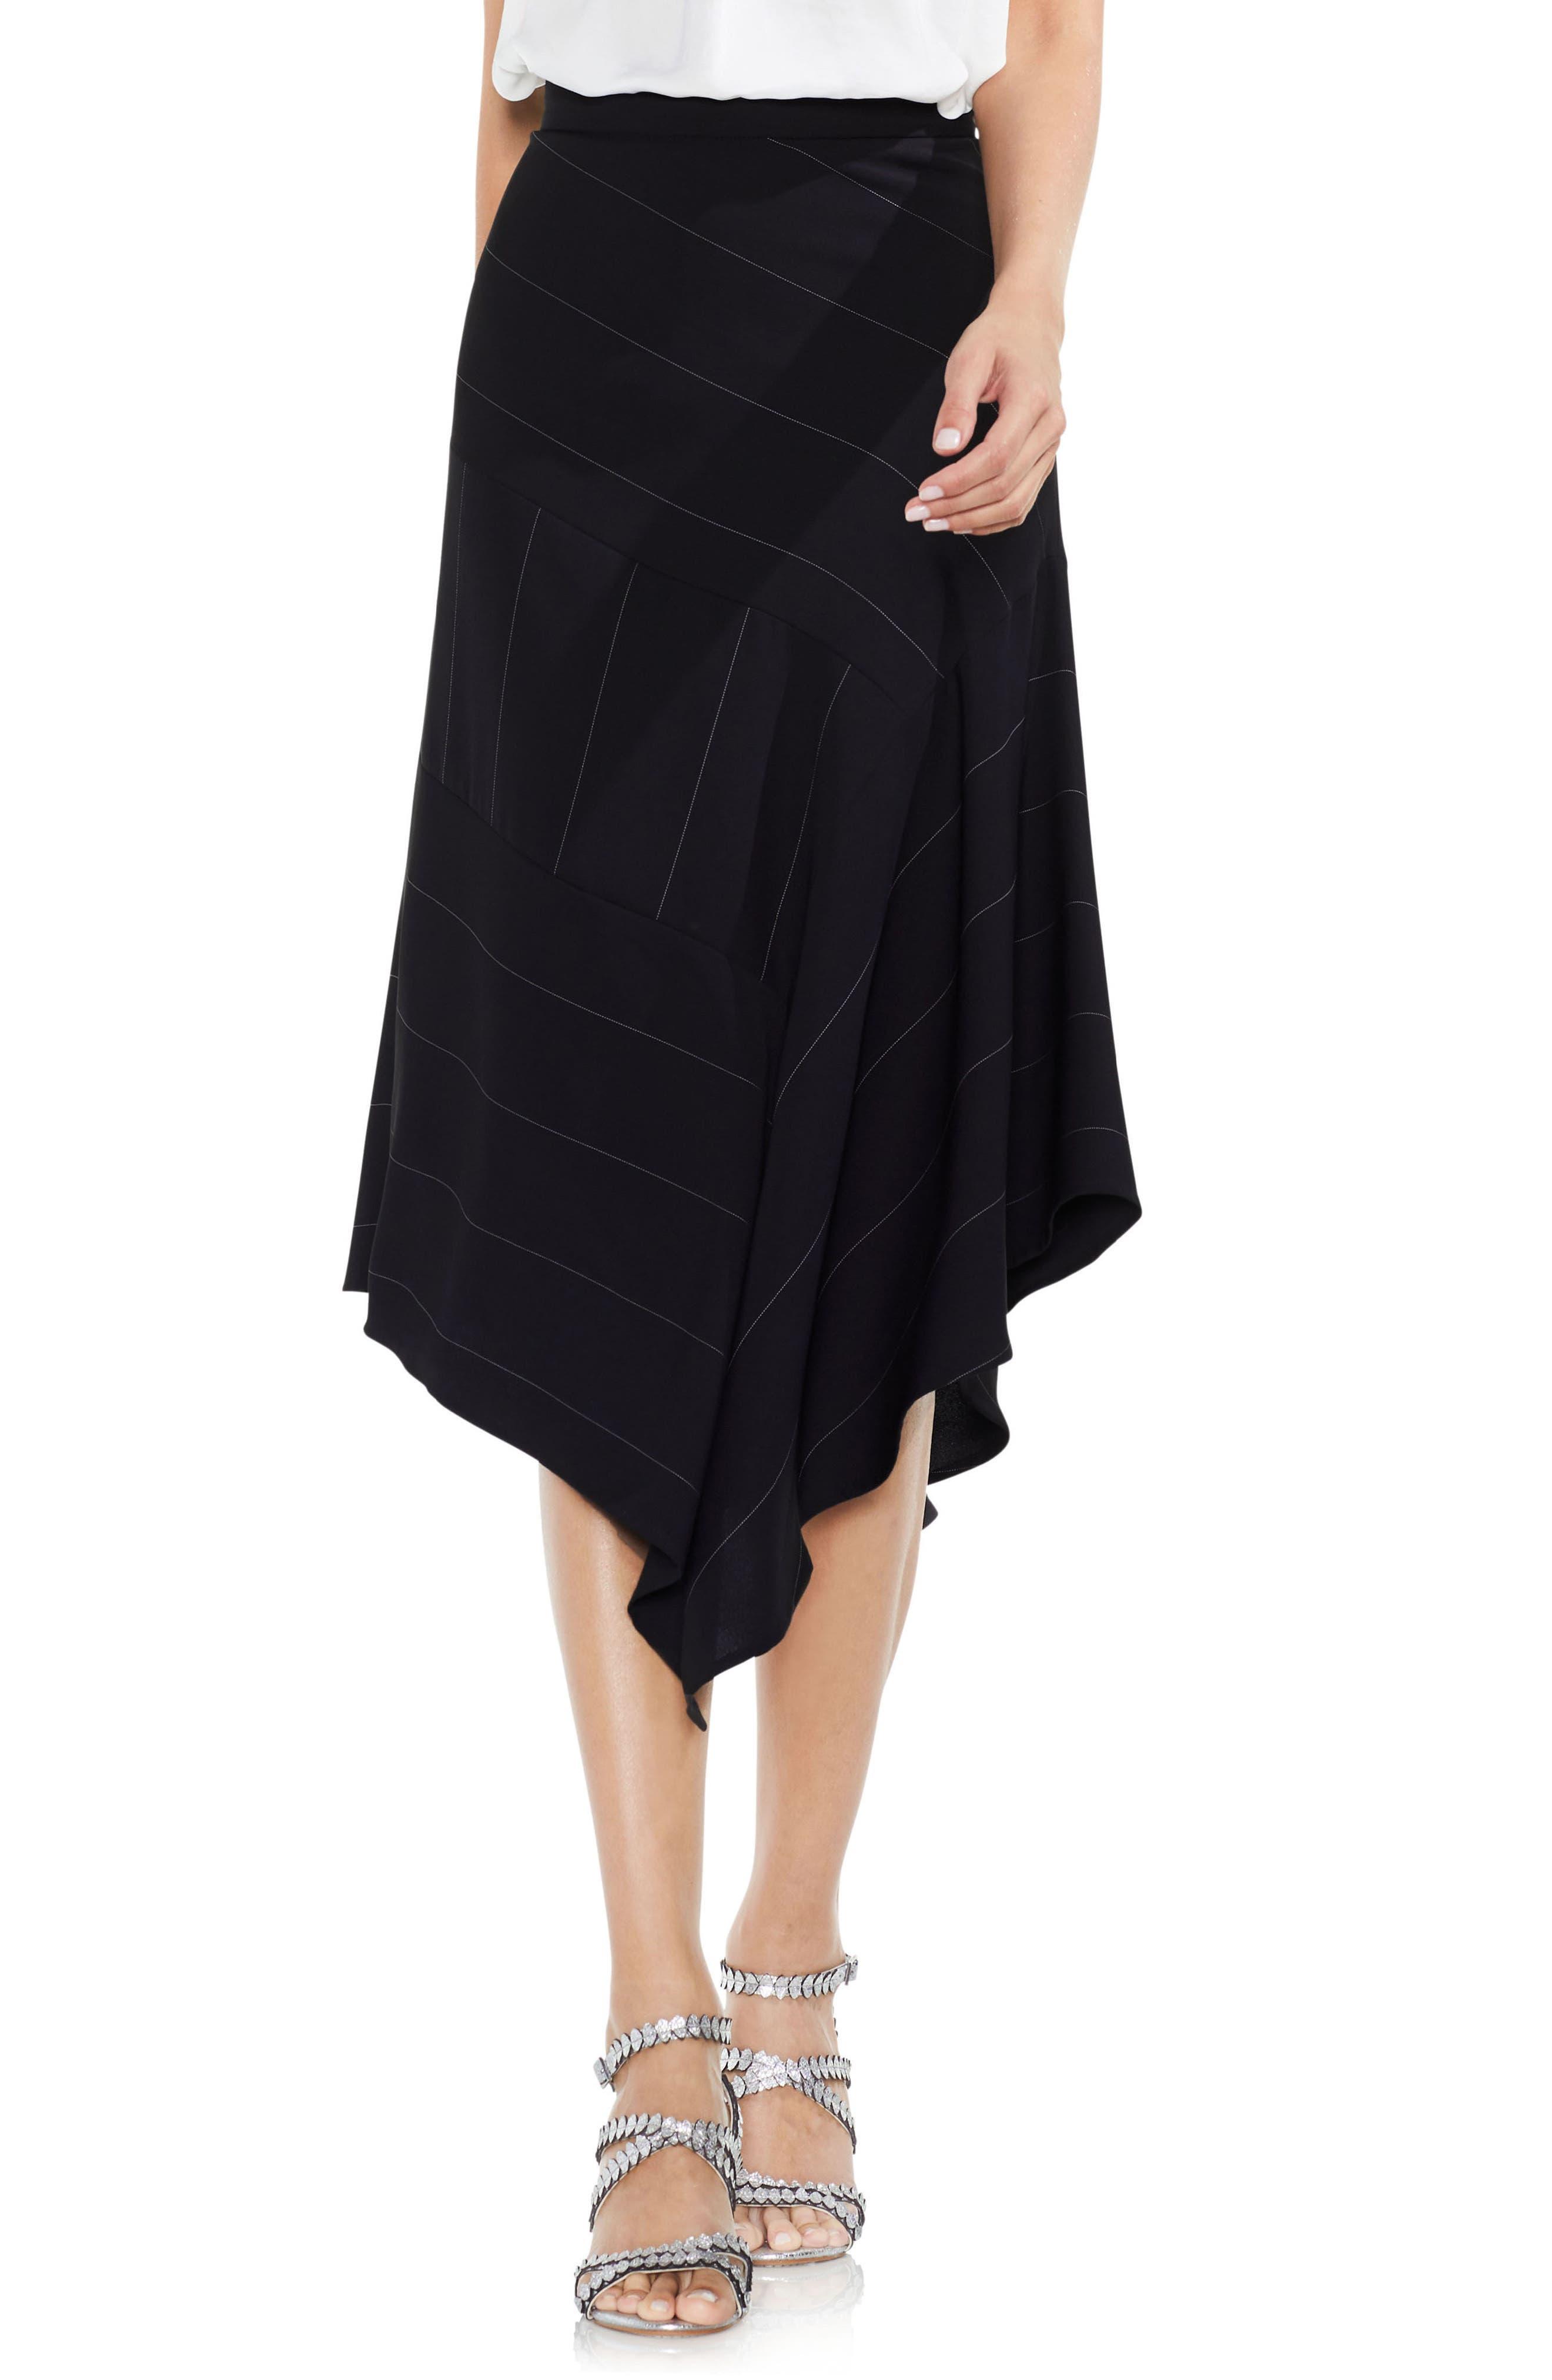 Alternate Image 1 Selected - Vince Camuto Chalk Stripe Asymmetrical Hem Skirt